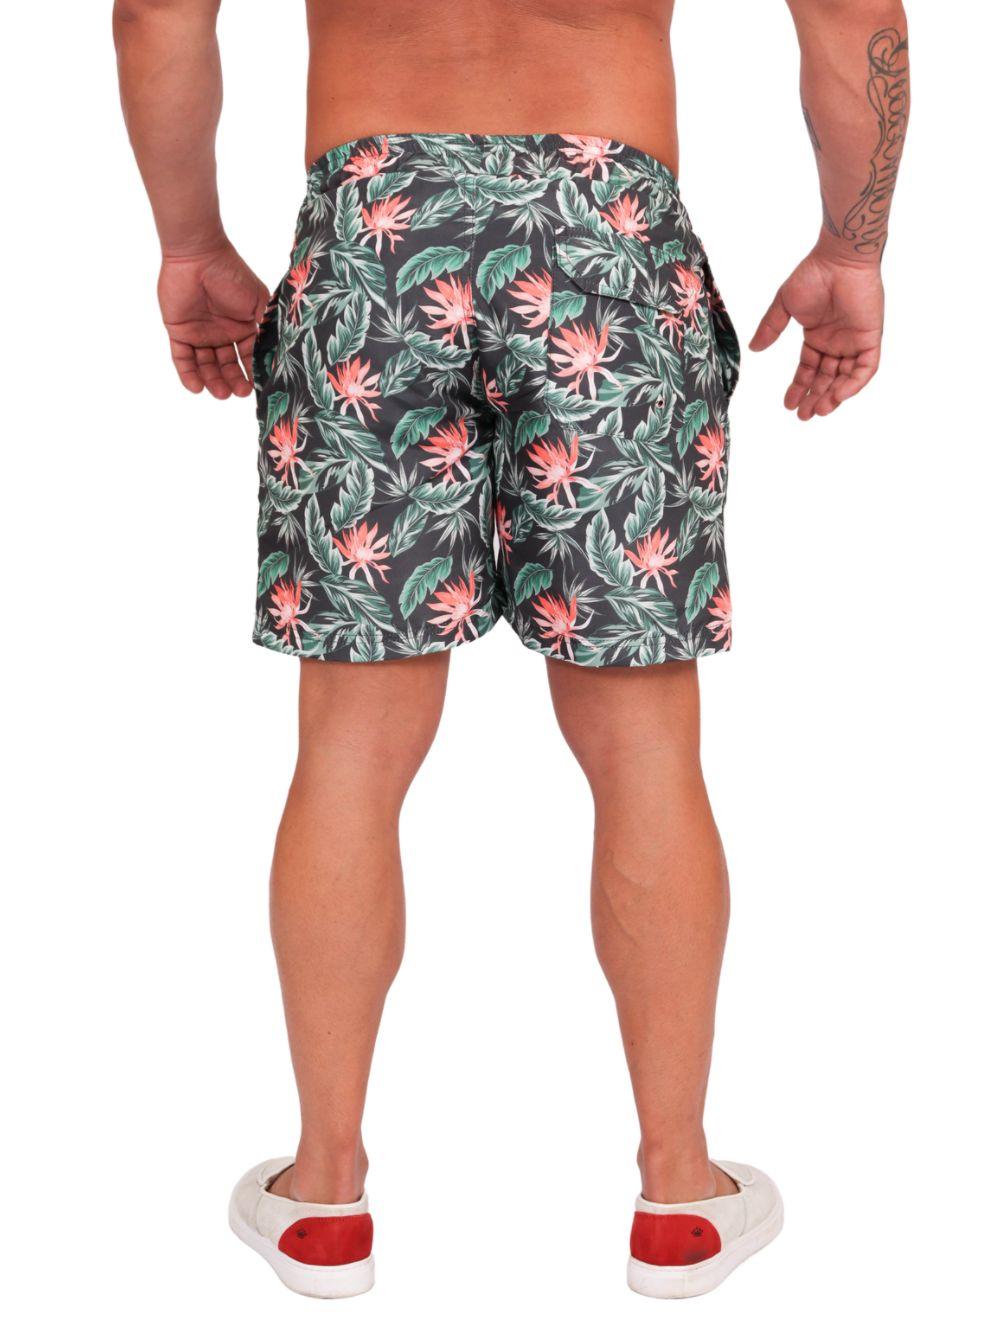 Shorts Praia Masculino Estampado Folhas